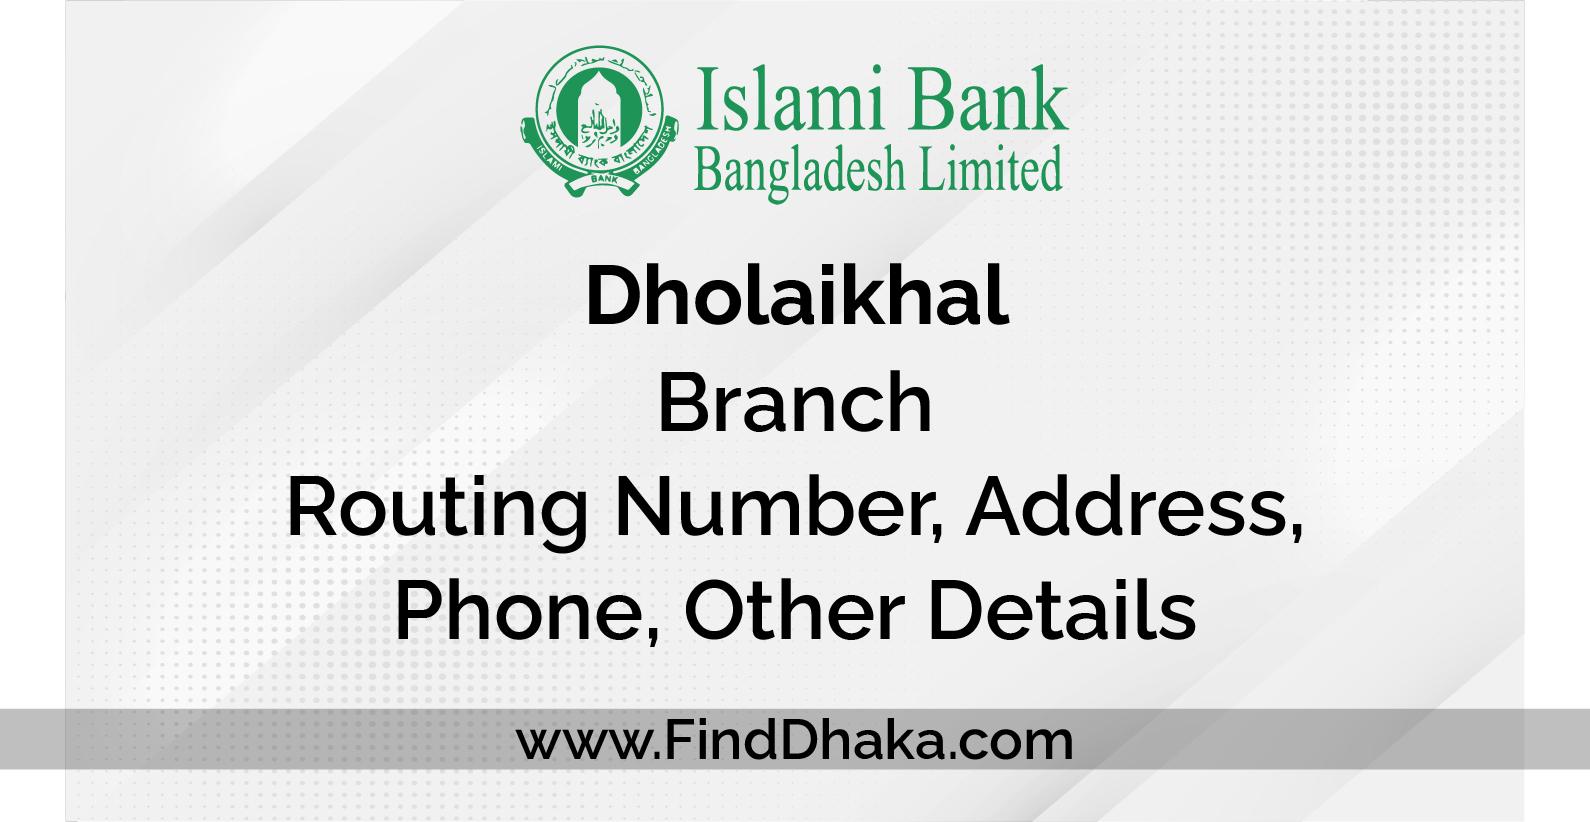 Islami Bank info008000 2